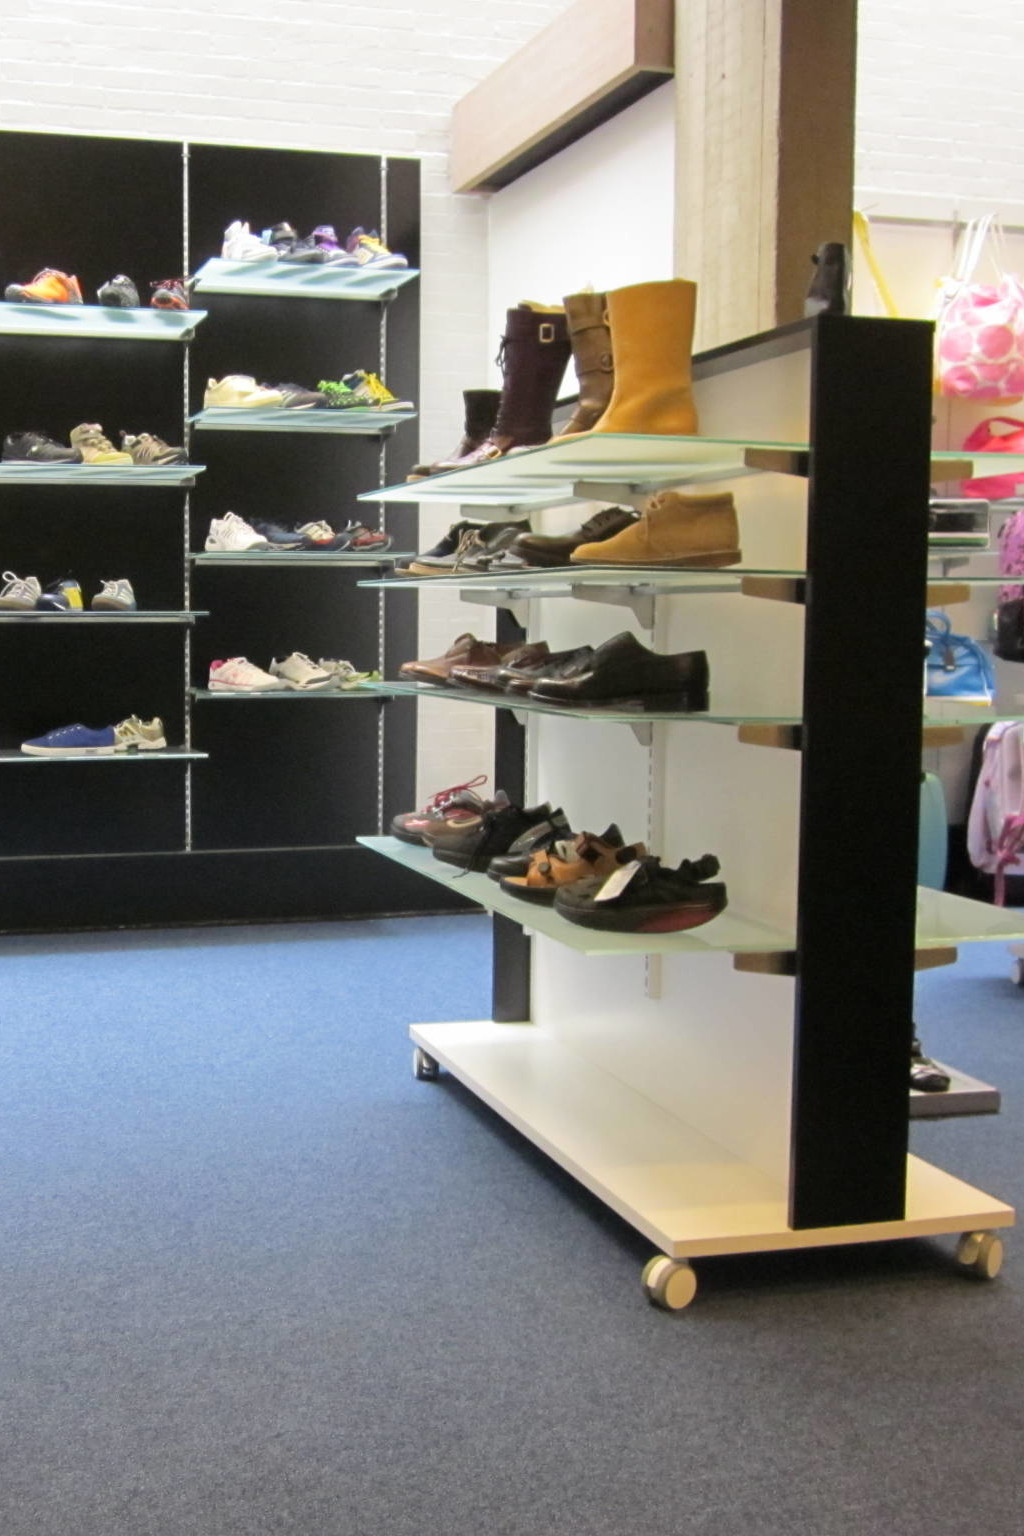 Stativet / rumdeleren præsenterer sko på den bedste vis. Bestem selv farvekombinationen på stativet. Butiksinventar